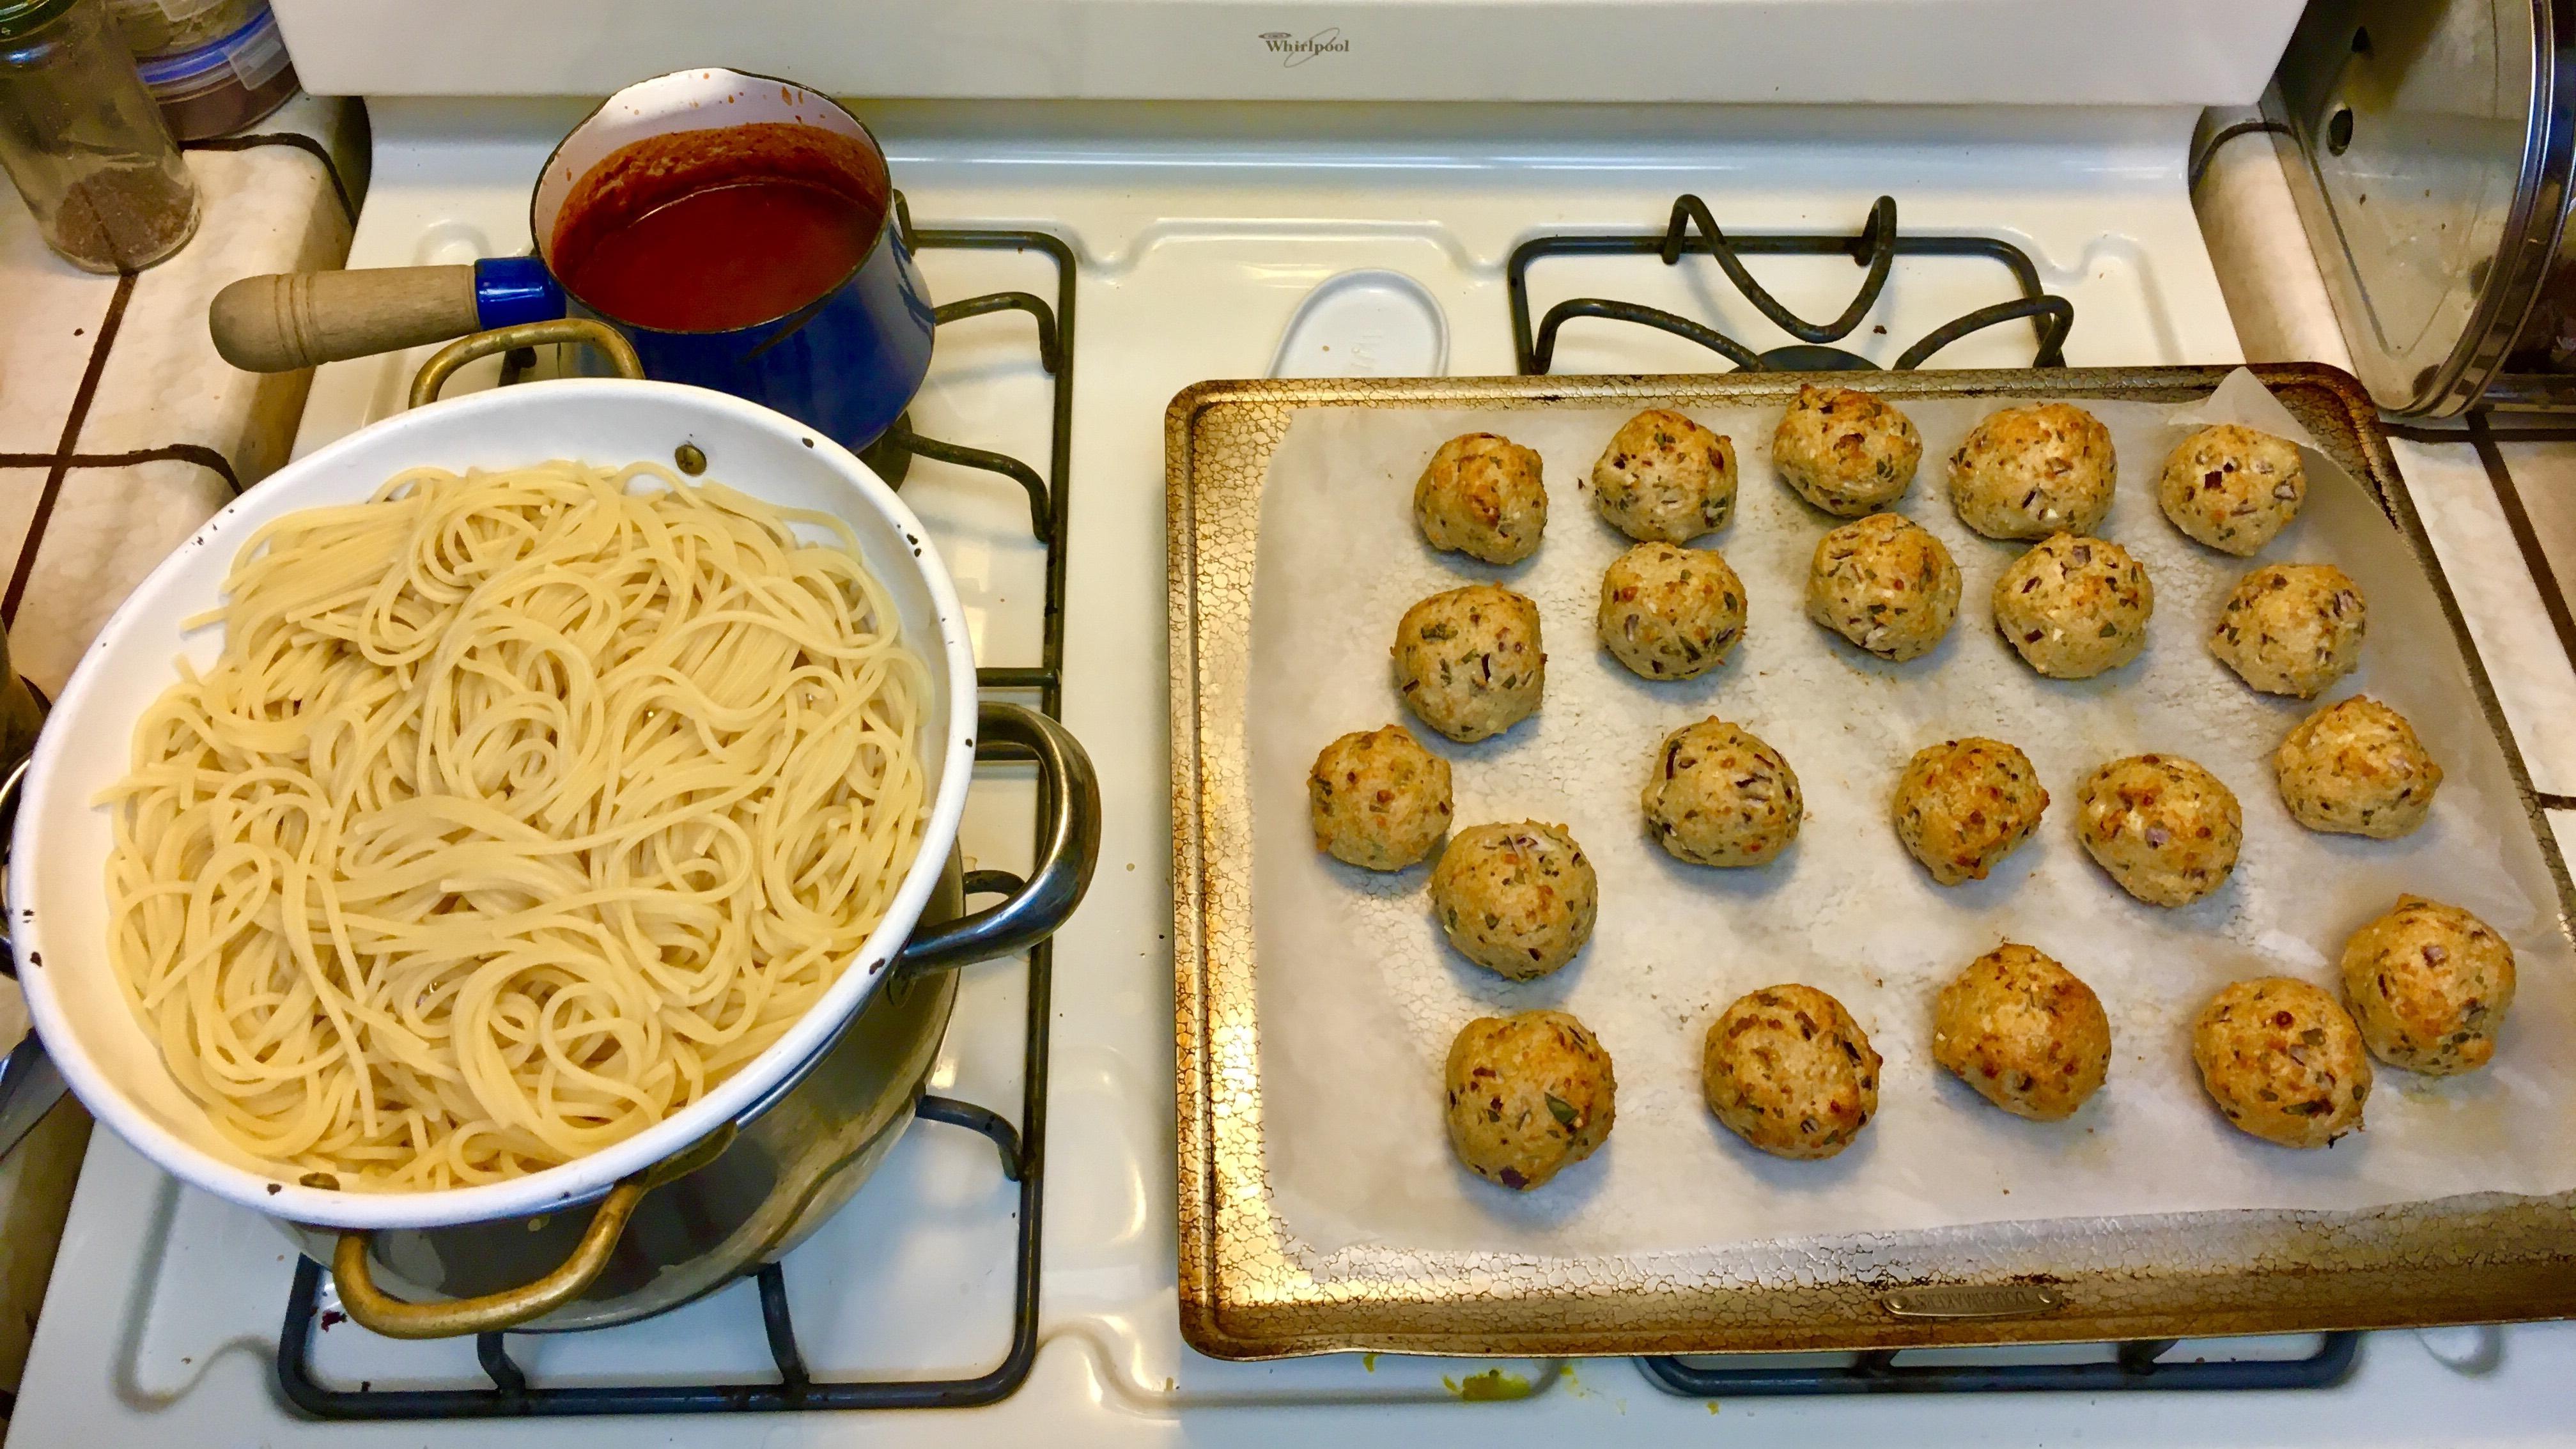 Feta and Olive Meatballs